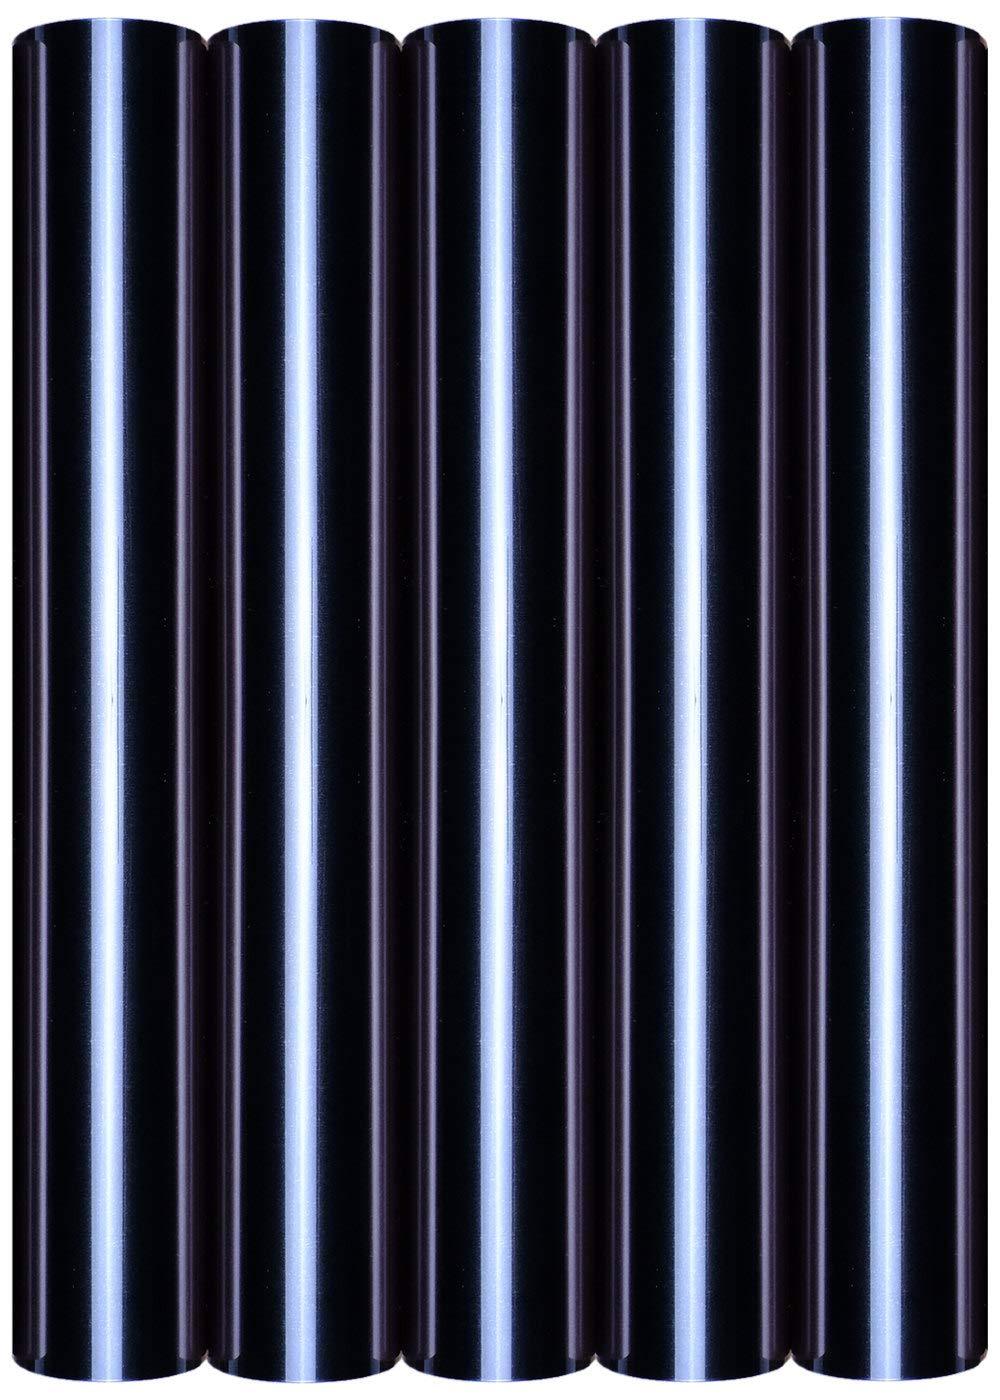 5 láminas de transferencia A4 para planchar sobre textiles, perfectas para plotter, P.S. Film:5er Set Black: Amazon.es: Oficina y papelería